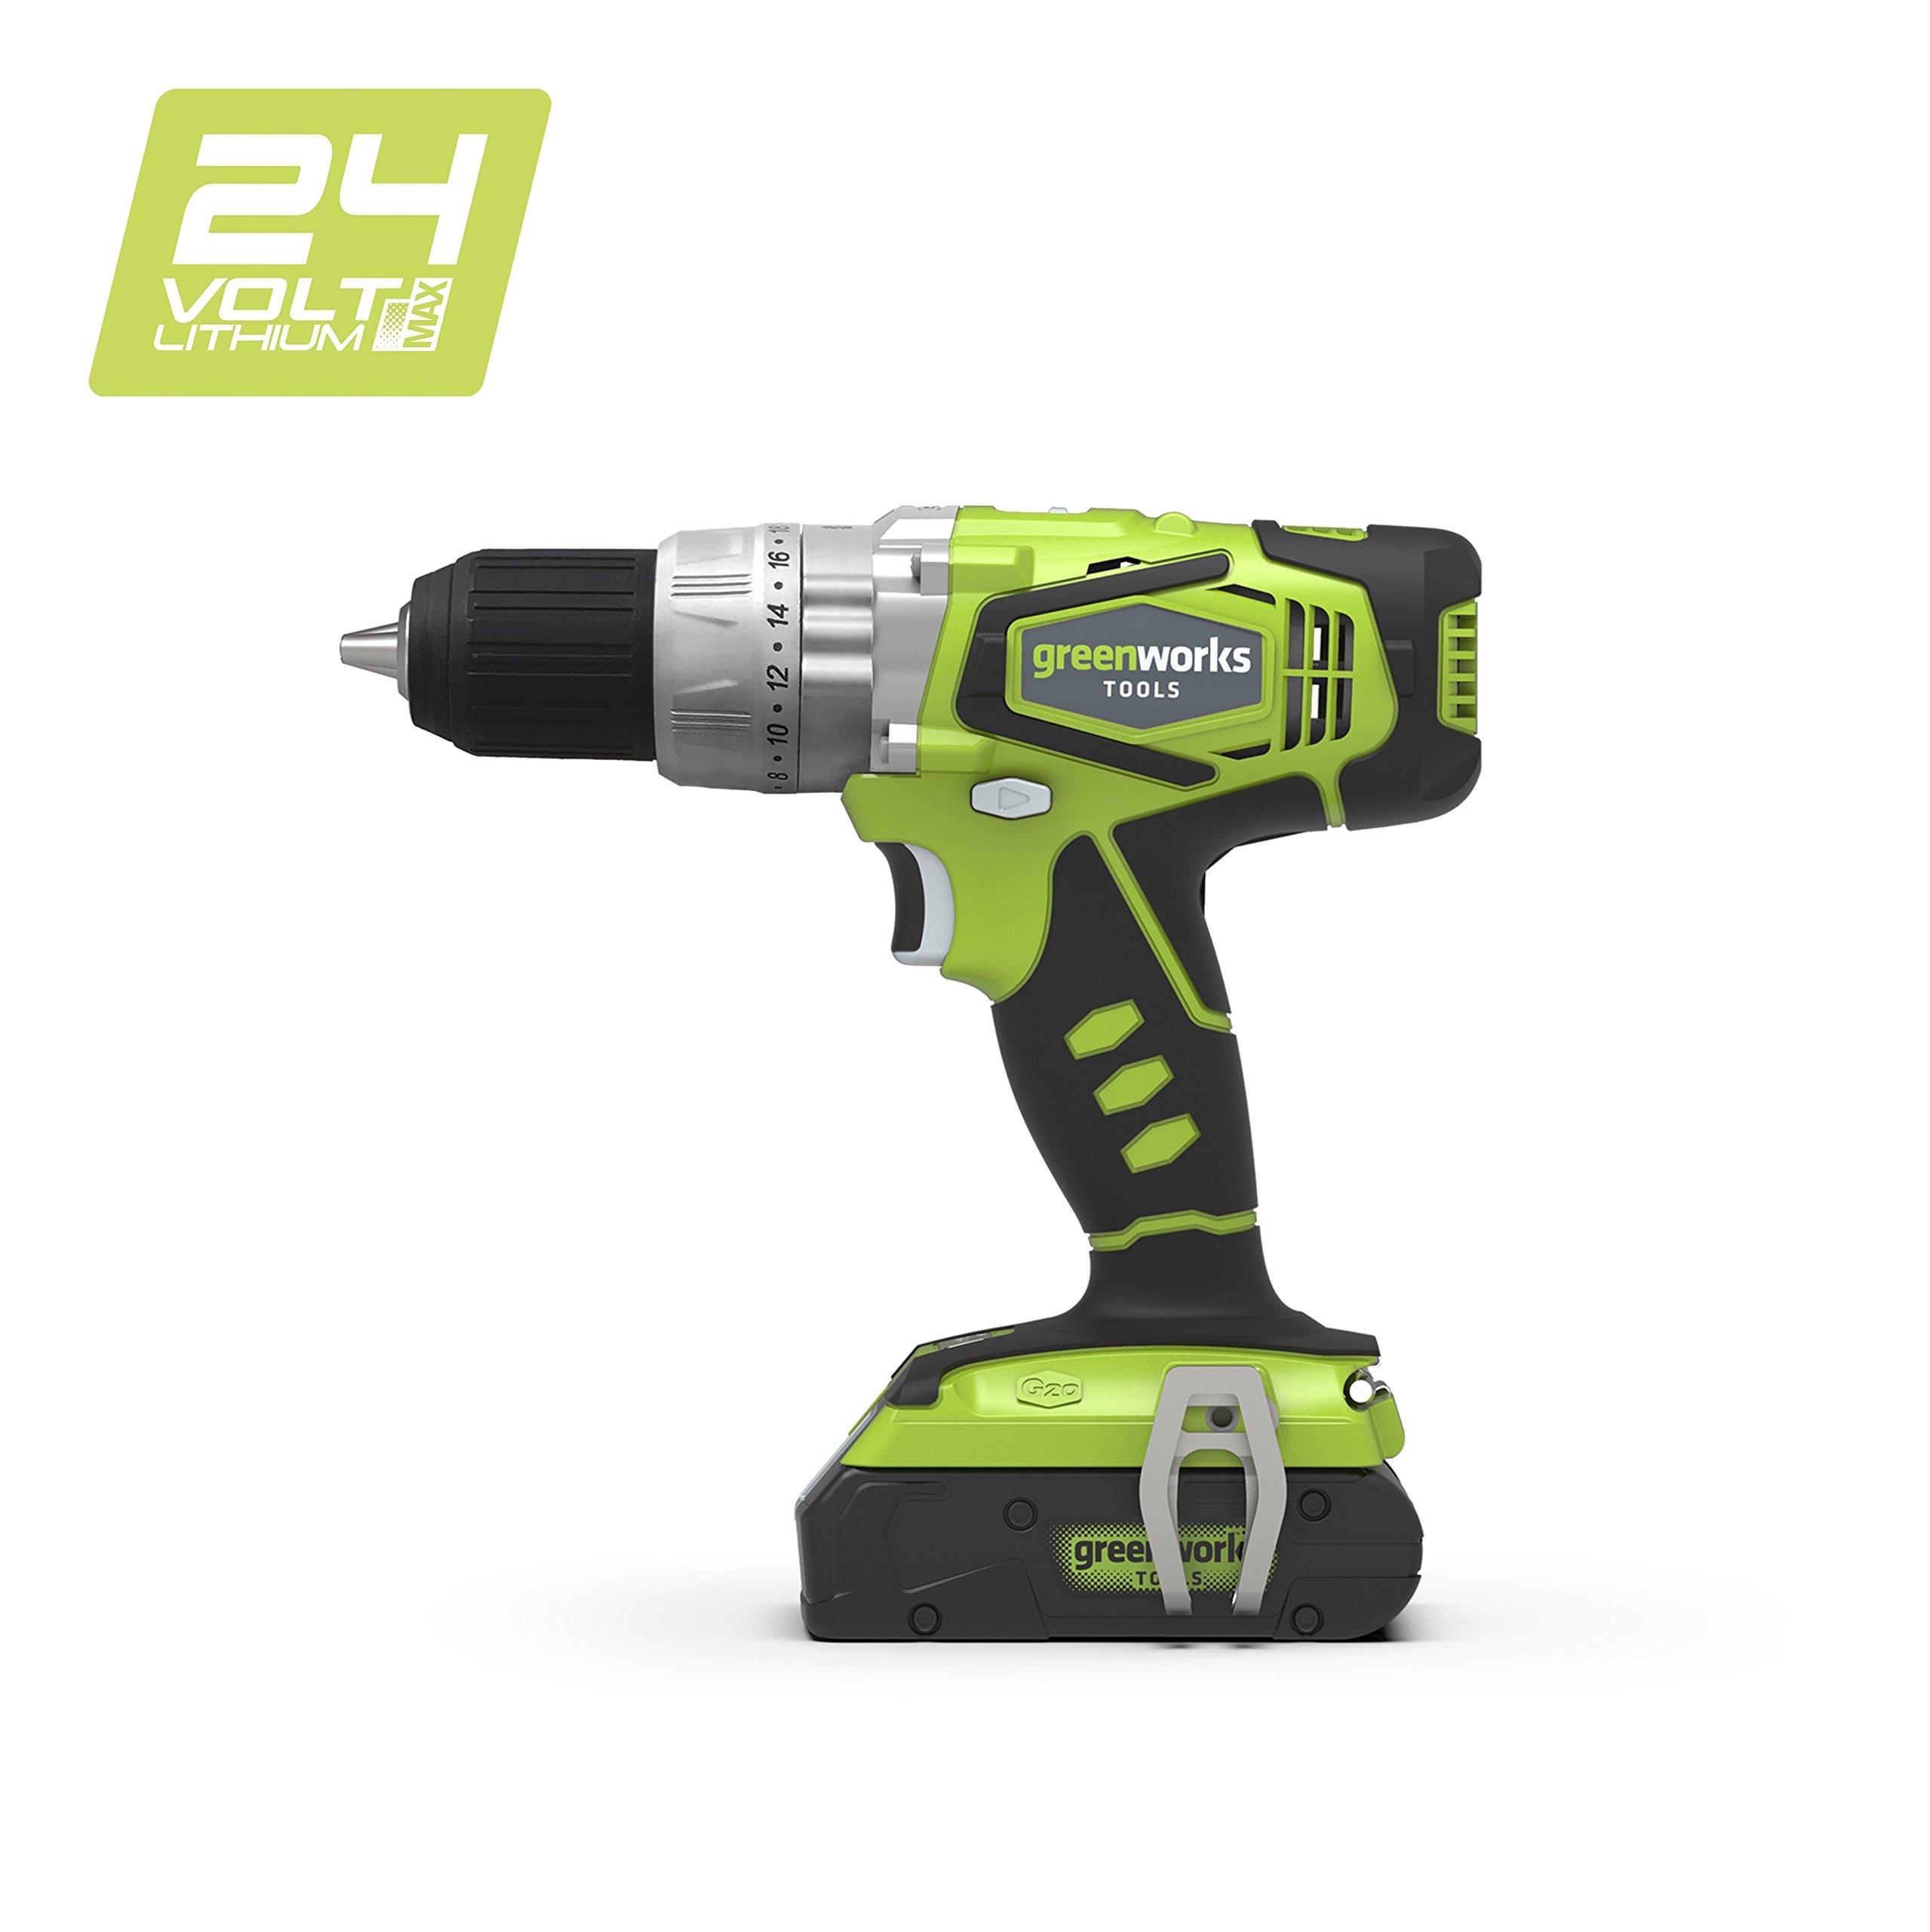 Greenworks-24V-Akku-Kombi-Bohrhammer-ohne-Akku-und-Ladegert-3801107